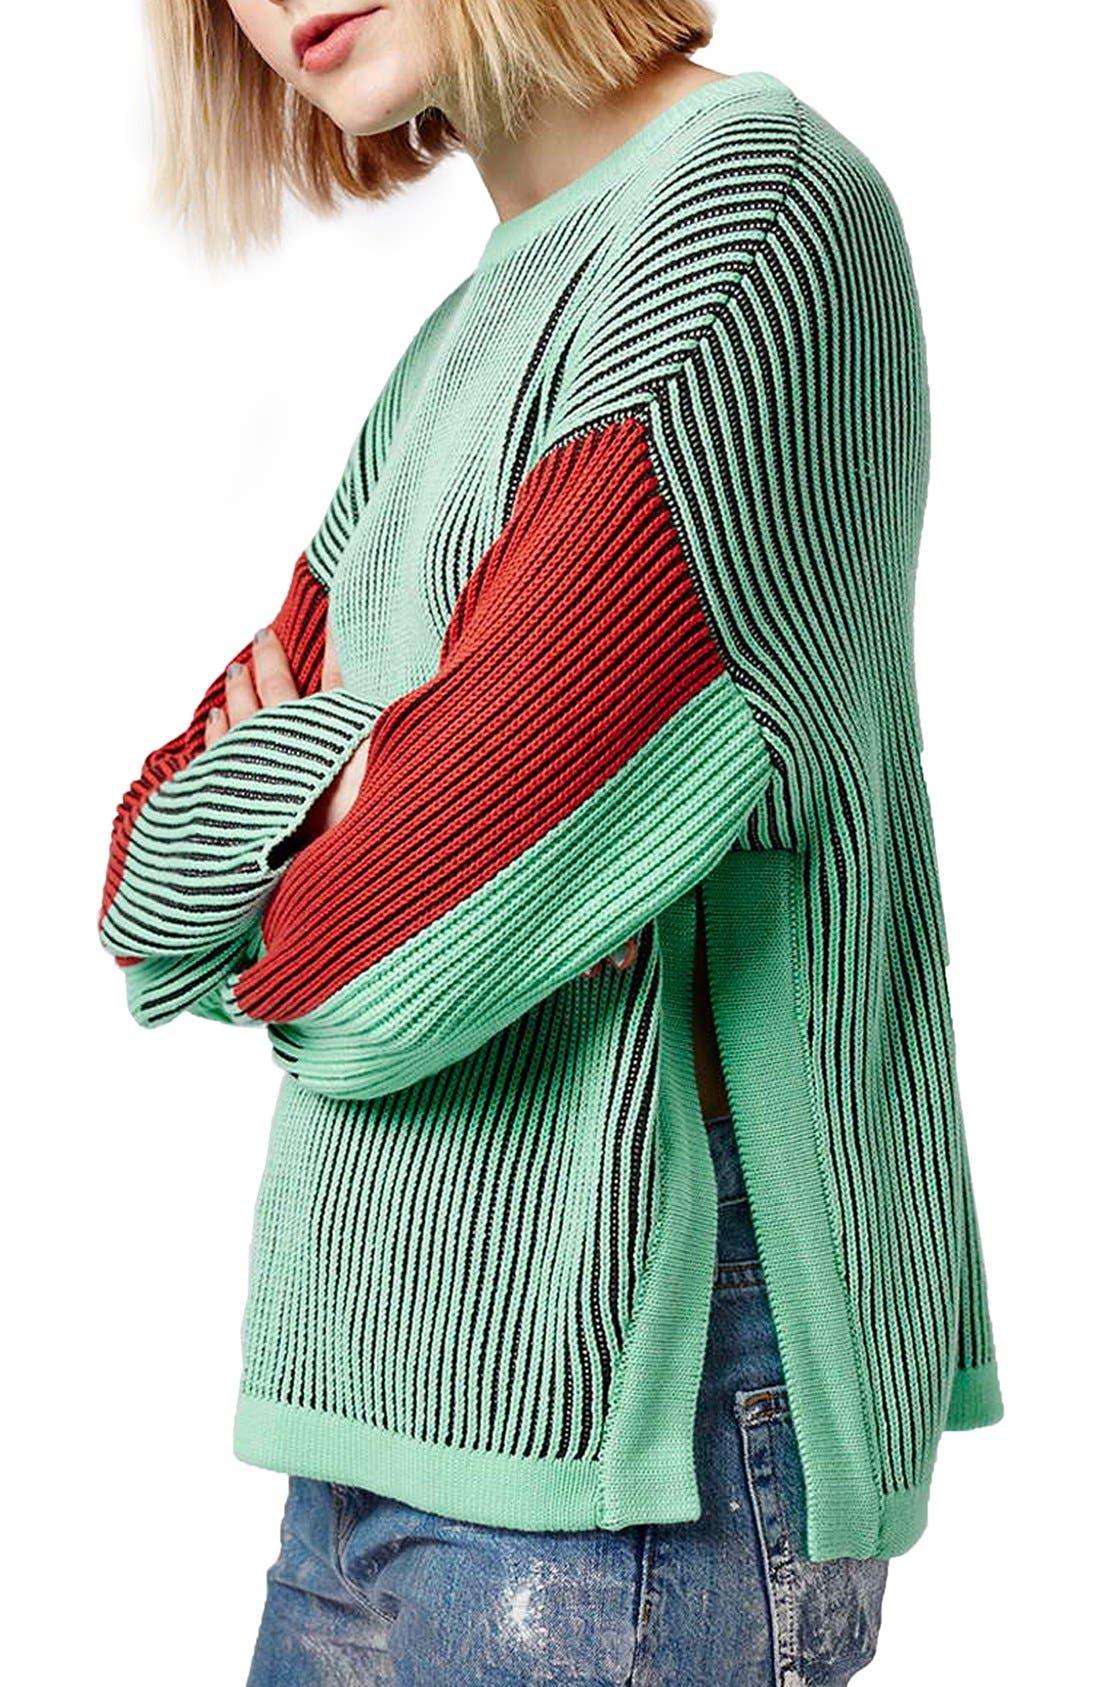 Alternate Image 1 Selected - Topshop Colorblock Crewneck Sweater